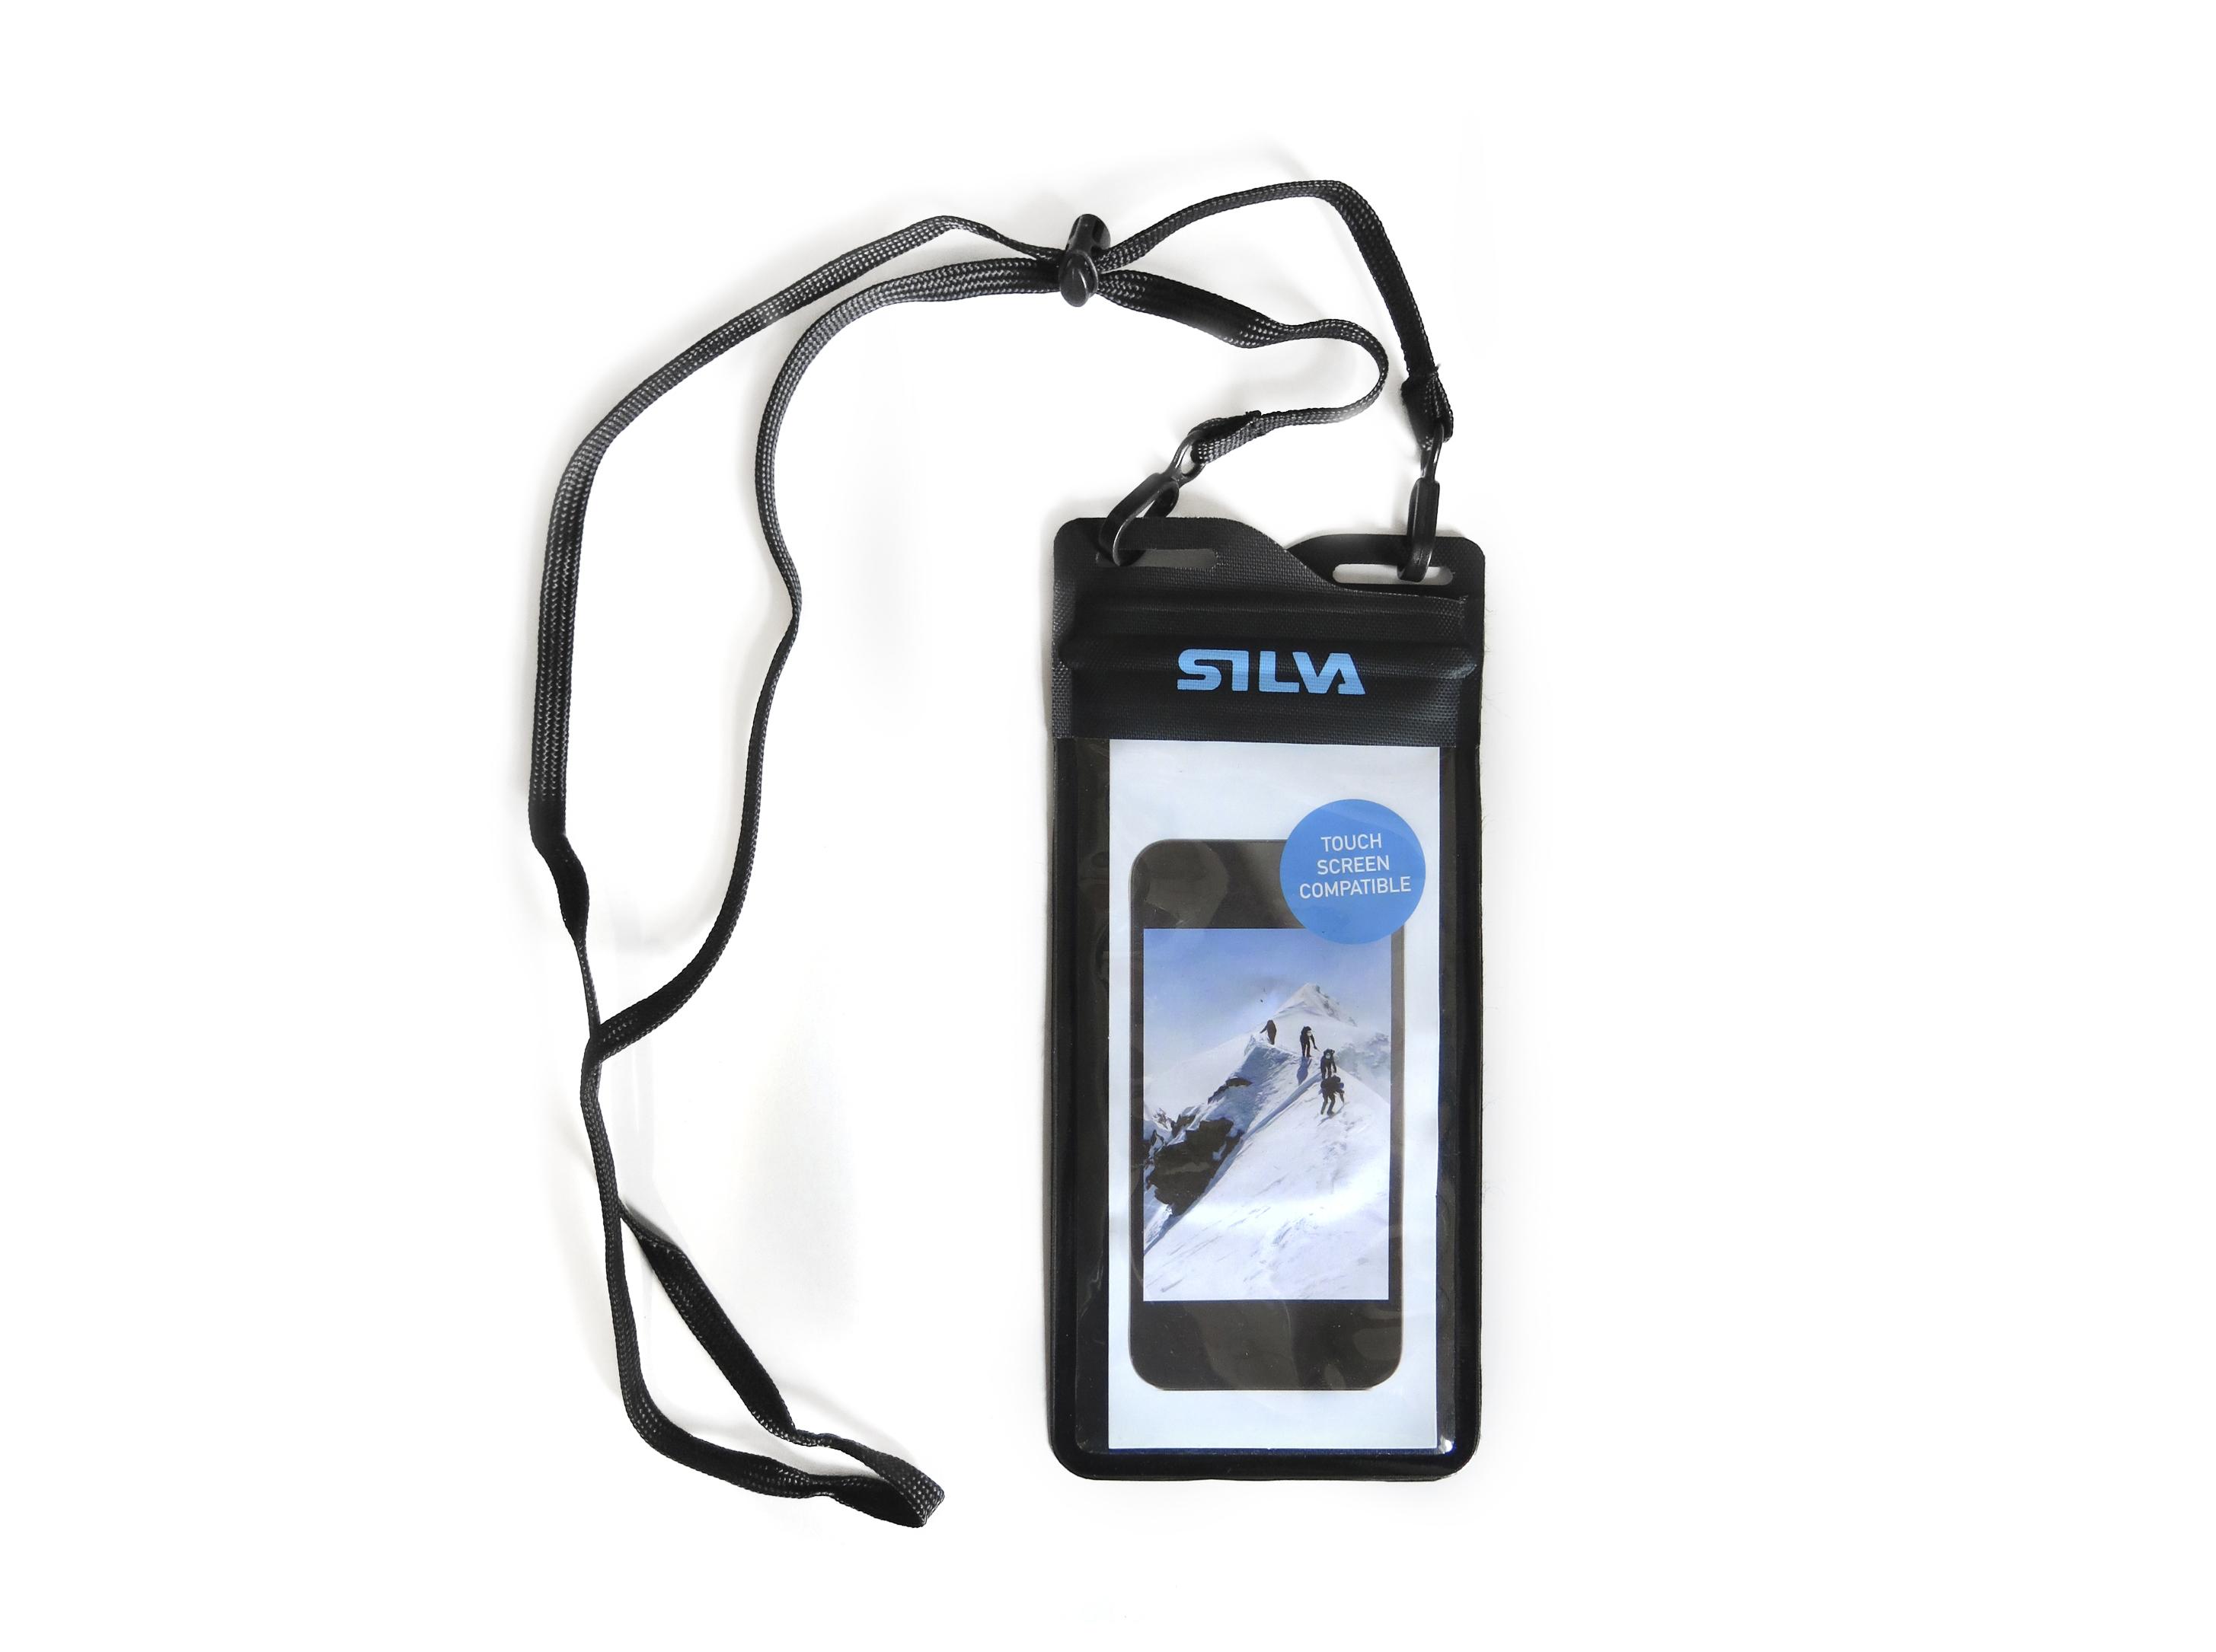 Чехол водонепроницаемый Silva Carry Dry Case S